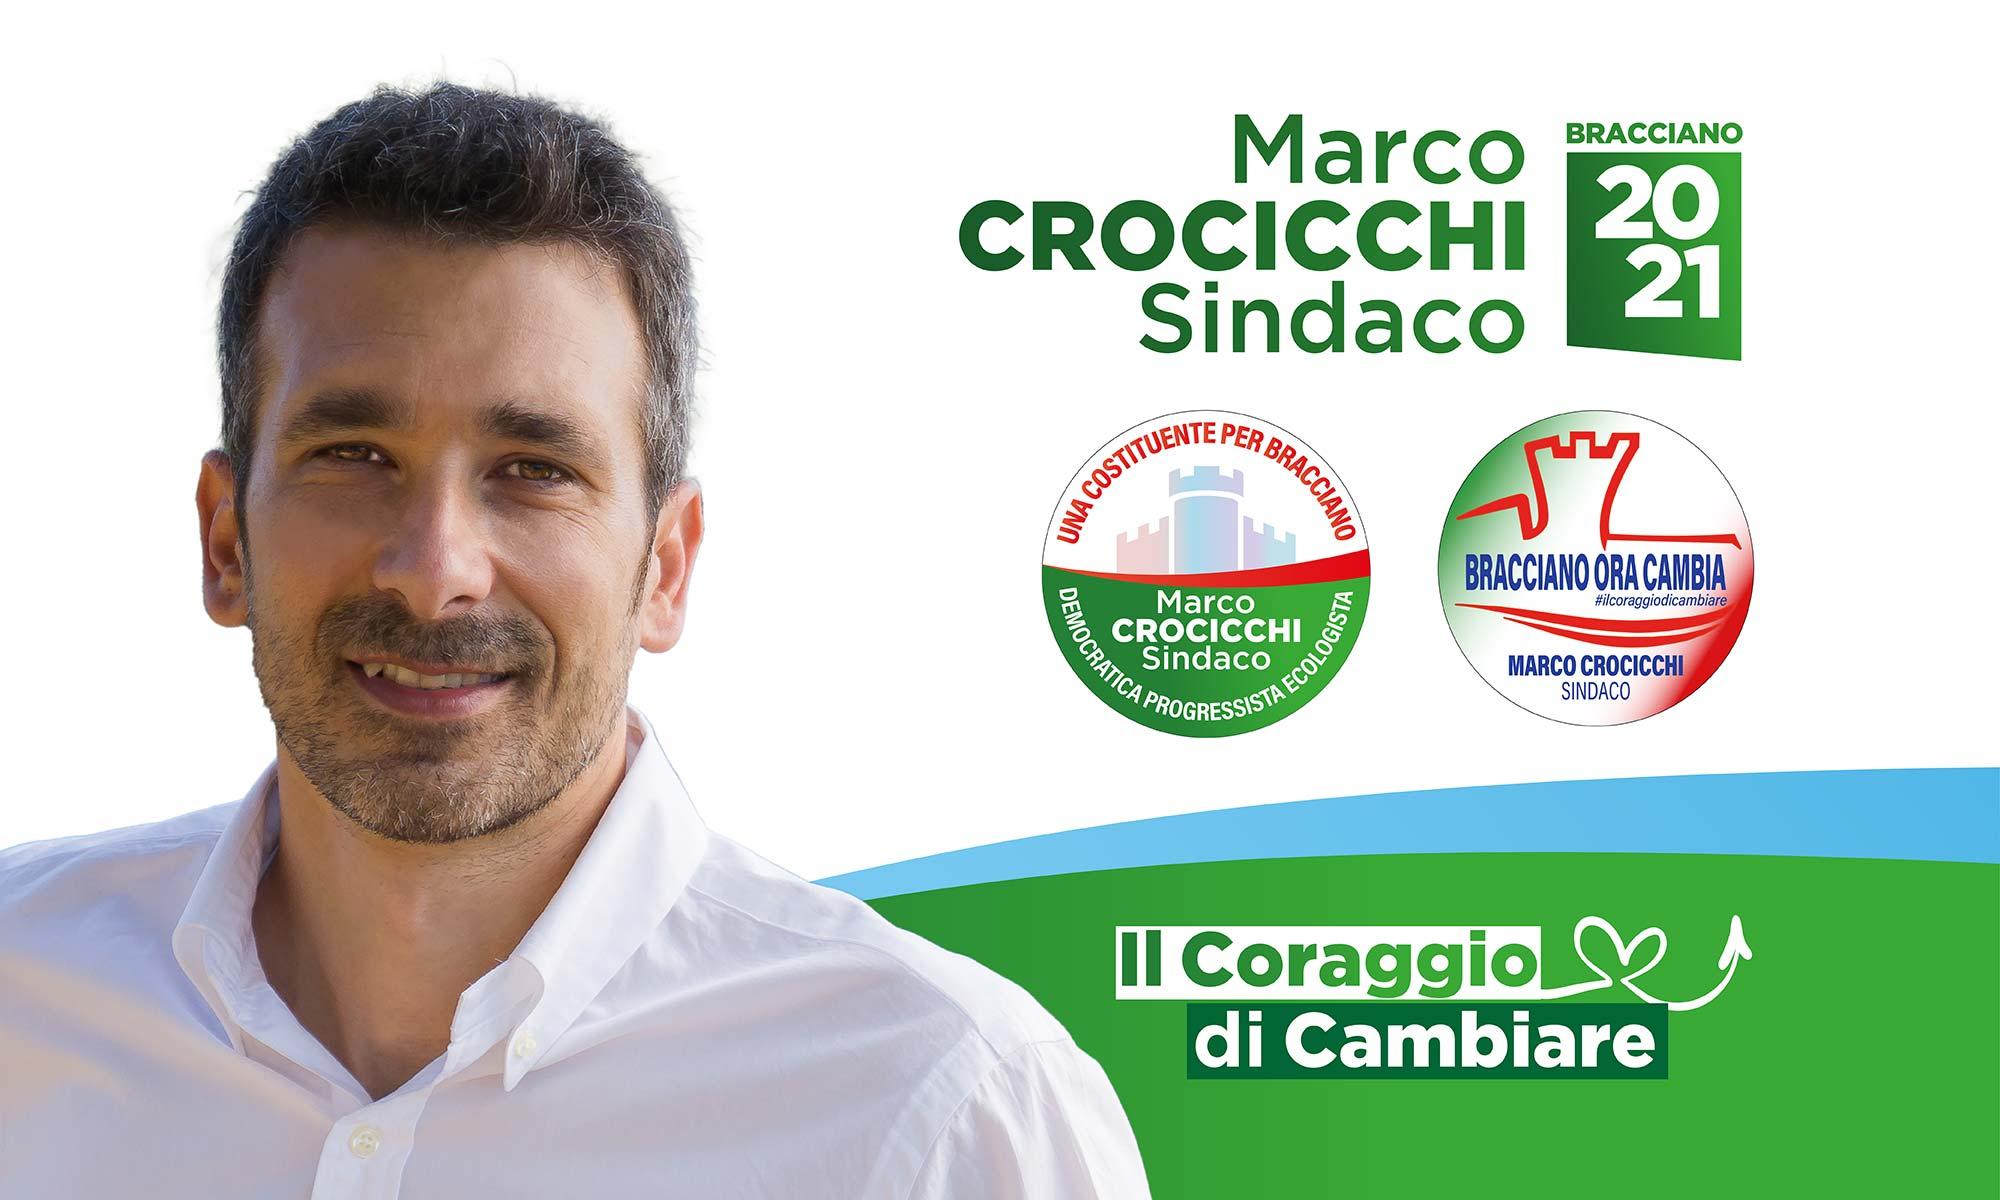 Marco Crocicchi Sindaco - Bracciano 2021